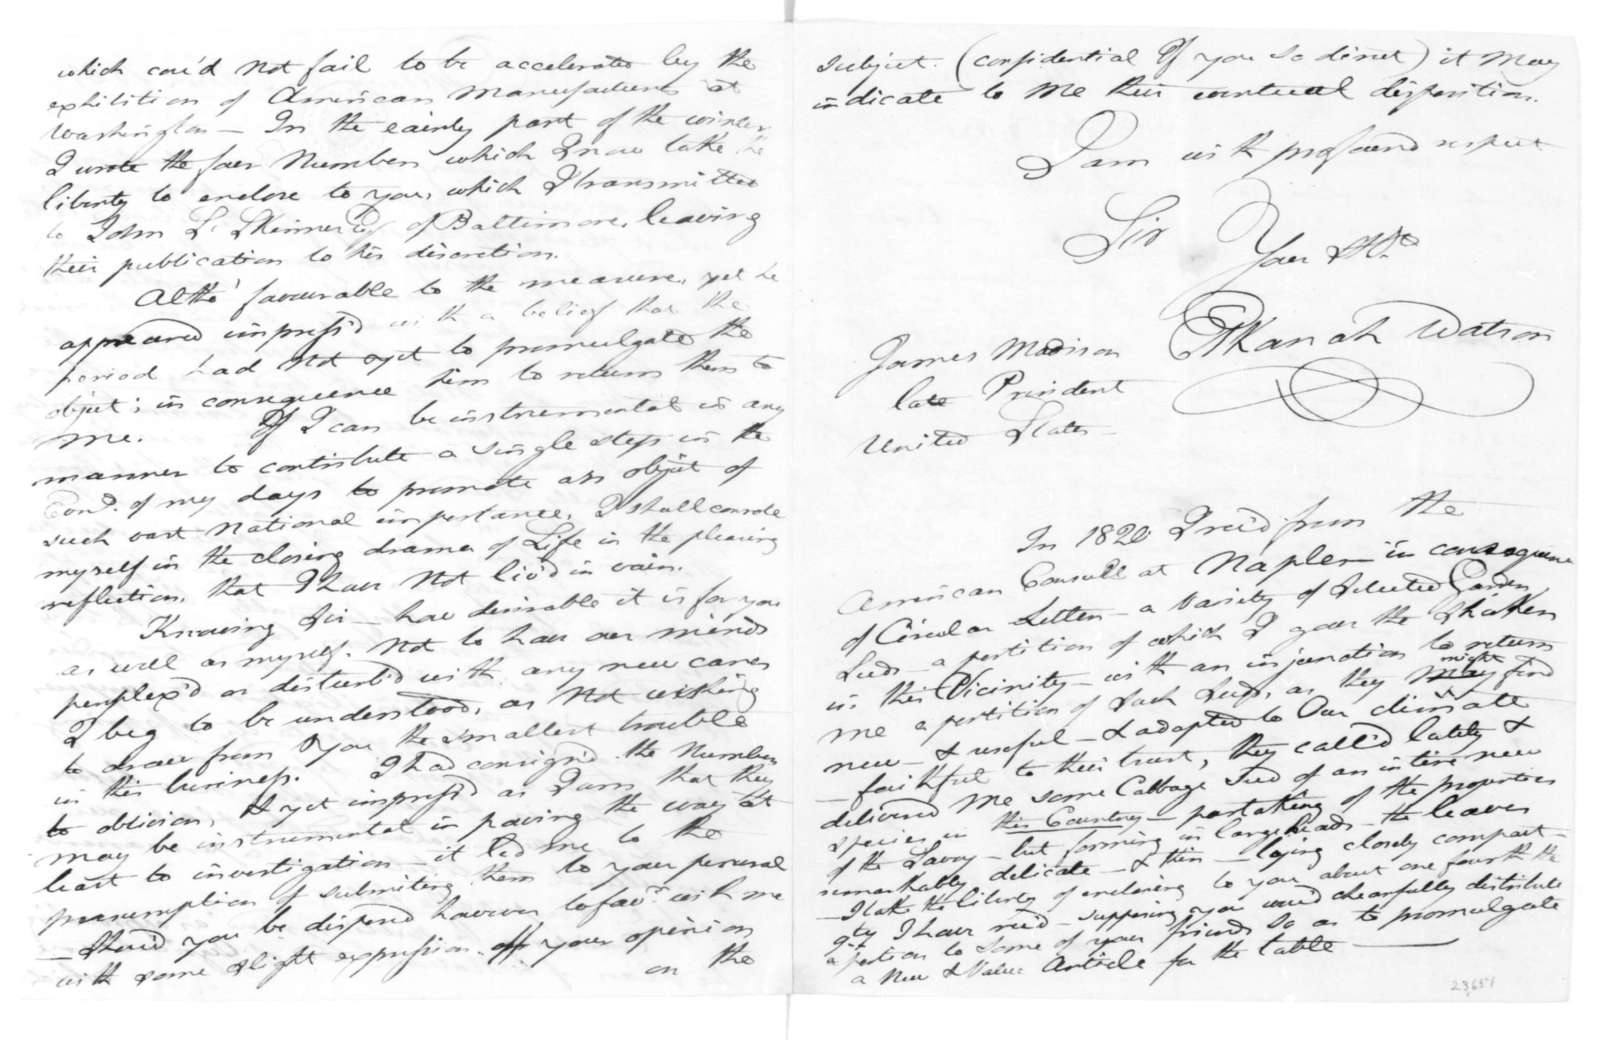 Elkanah Watson to James Madison, March 8, 1825.